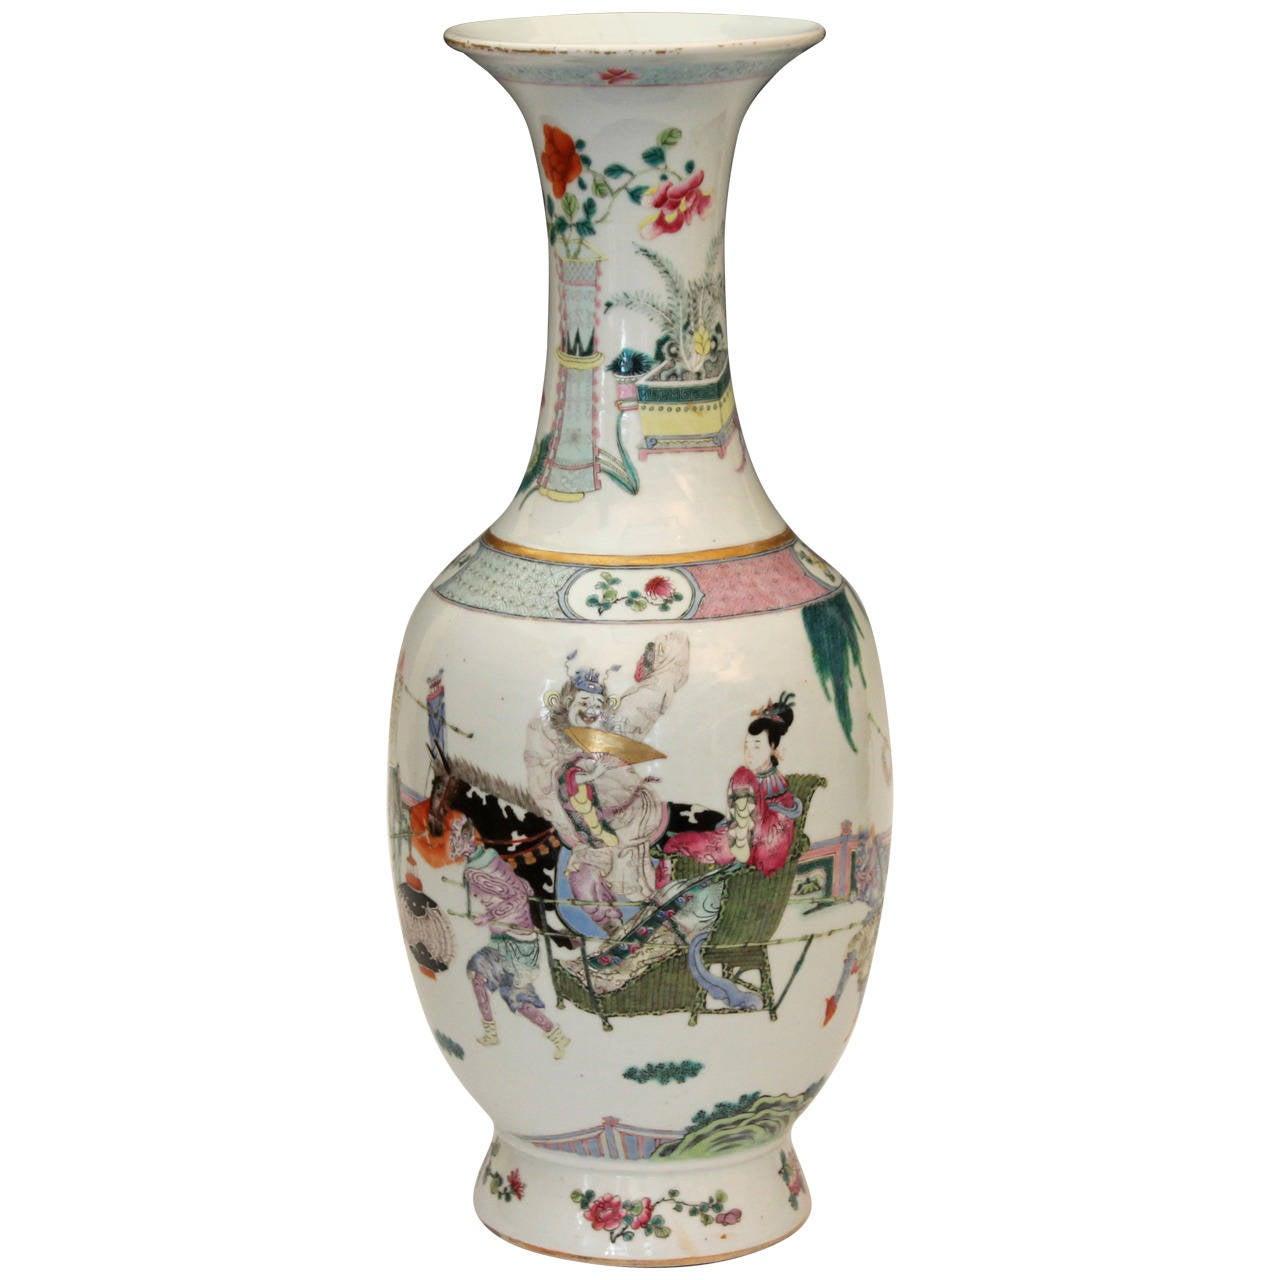 Antique qianlong mark chinese porcelain famille rose vase figures antique qianlong mark chinese porcelain famille rose vase figures gods demons for sale reviewsmspy